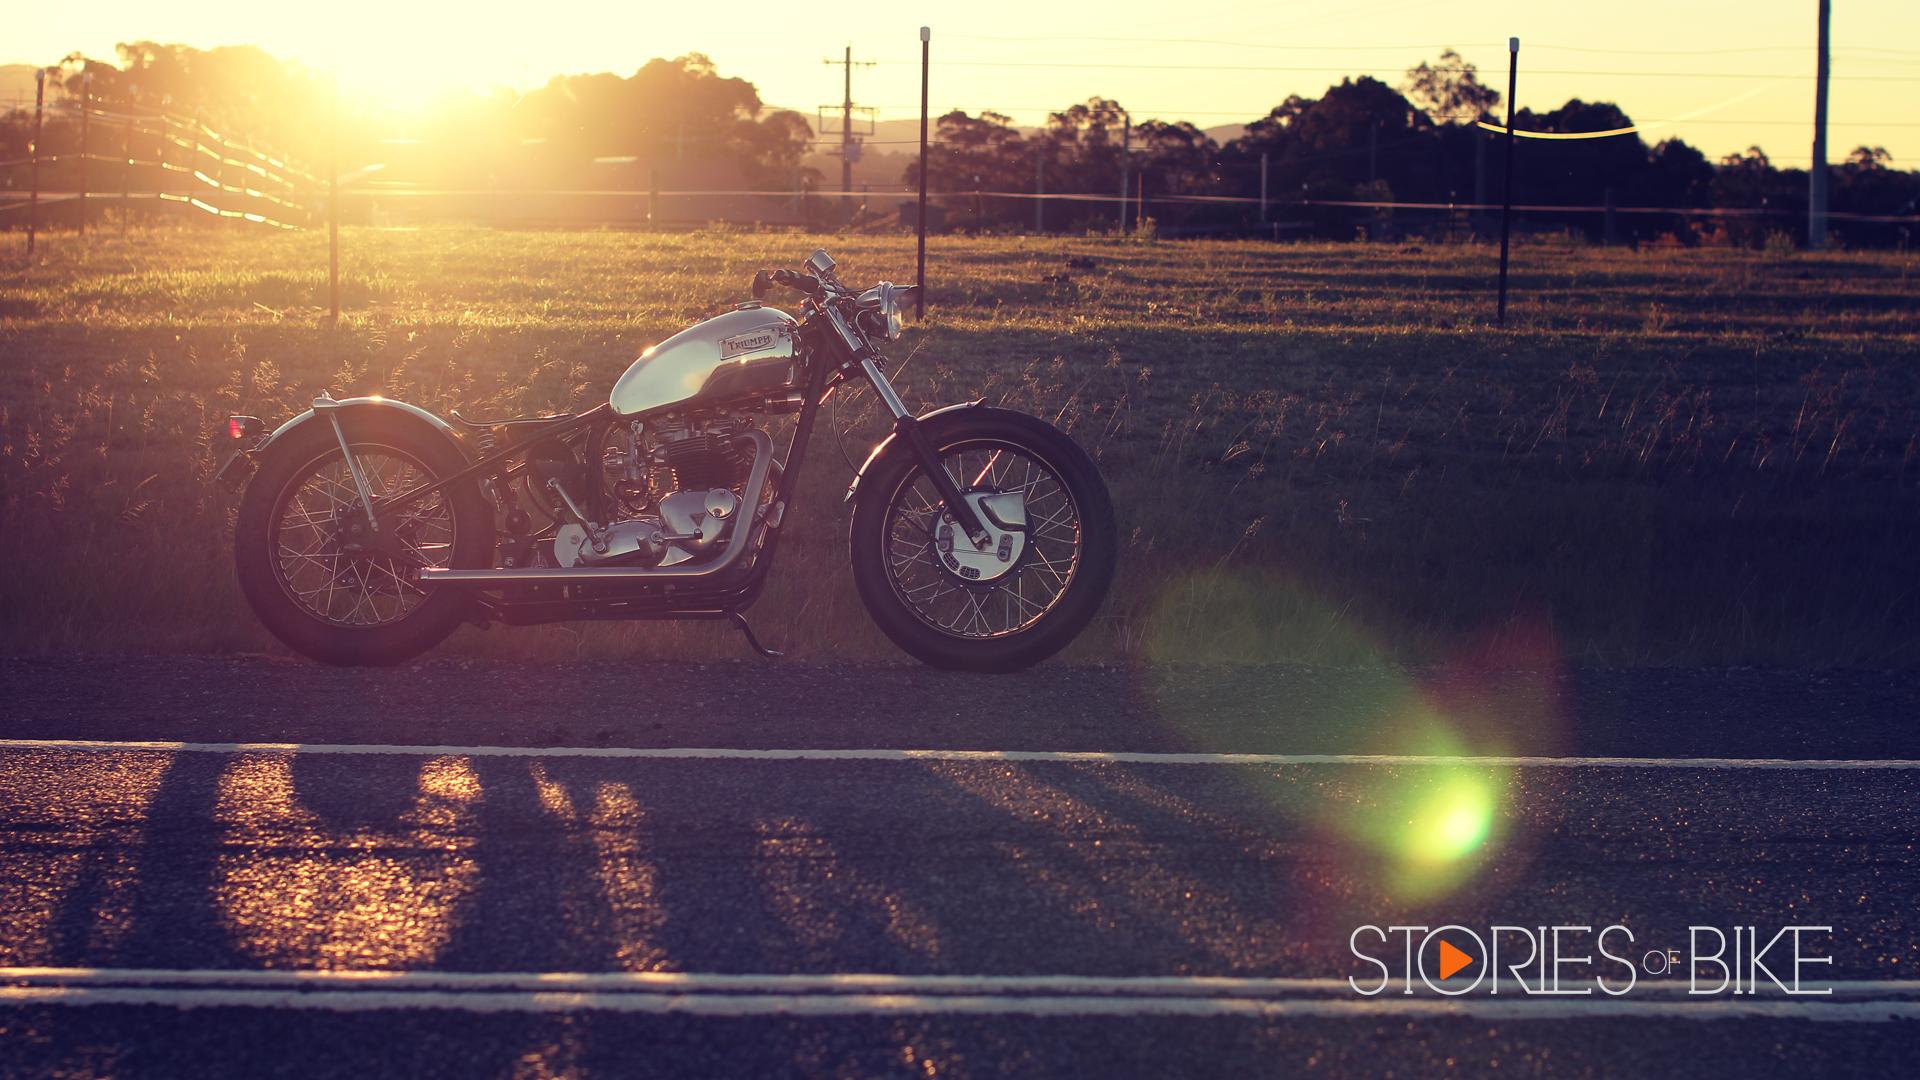 Stories_of_Bike_Publicity_Ep7_11.jpg